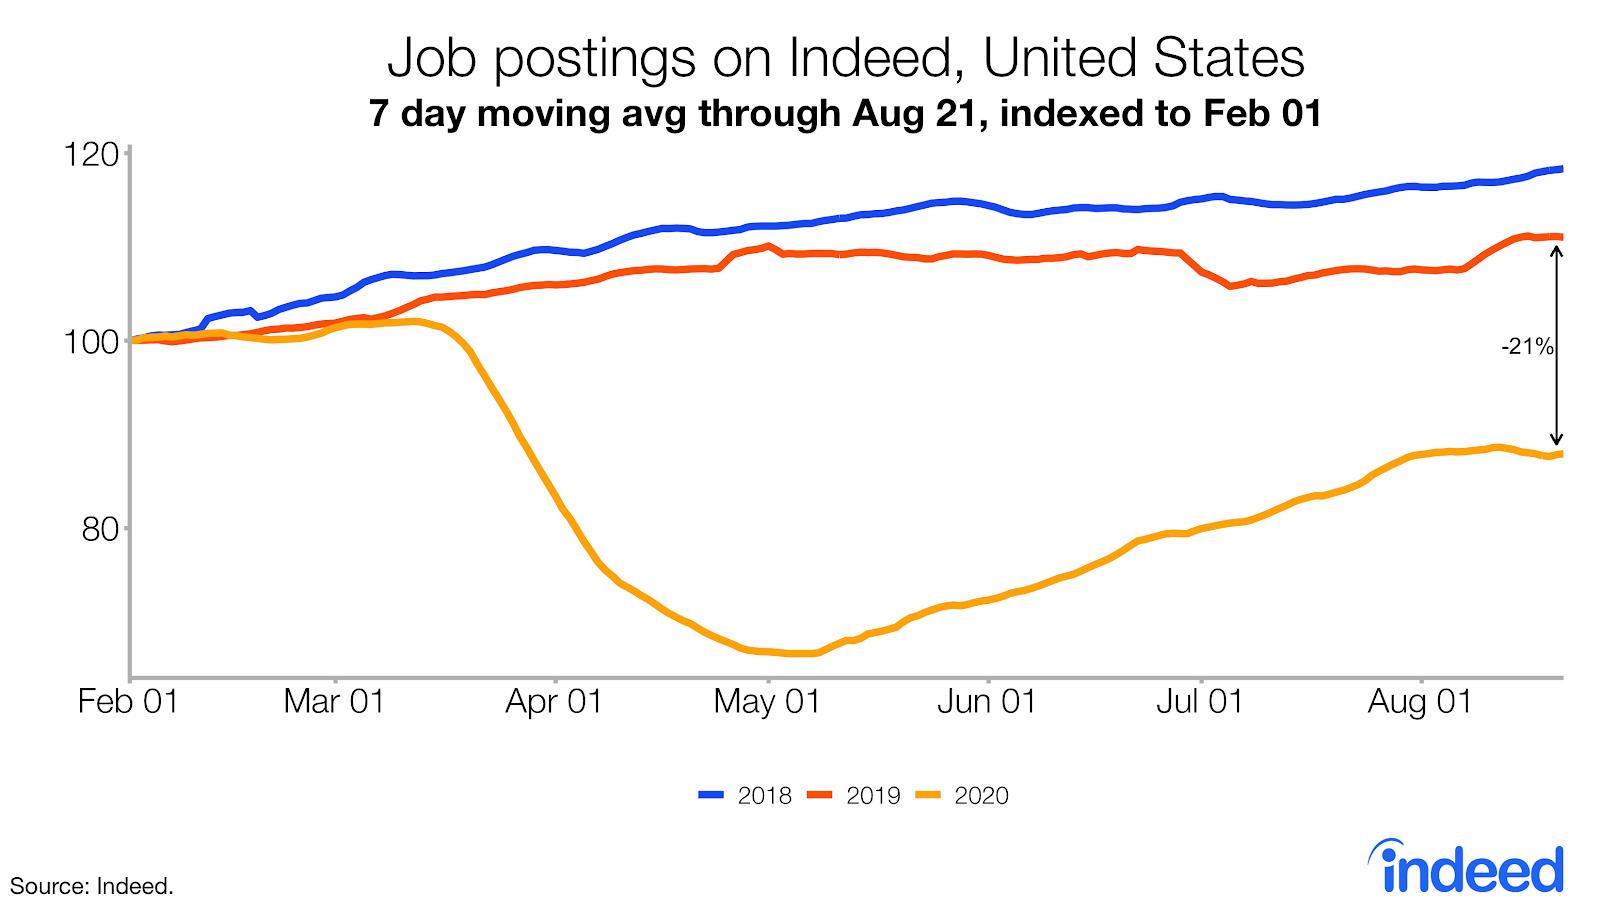 Hiring Lab rate of job postings on Indeed